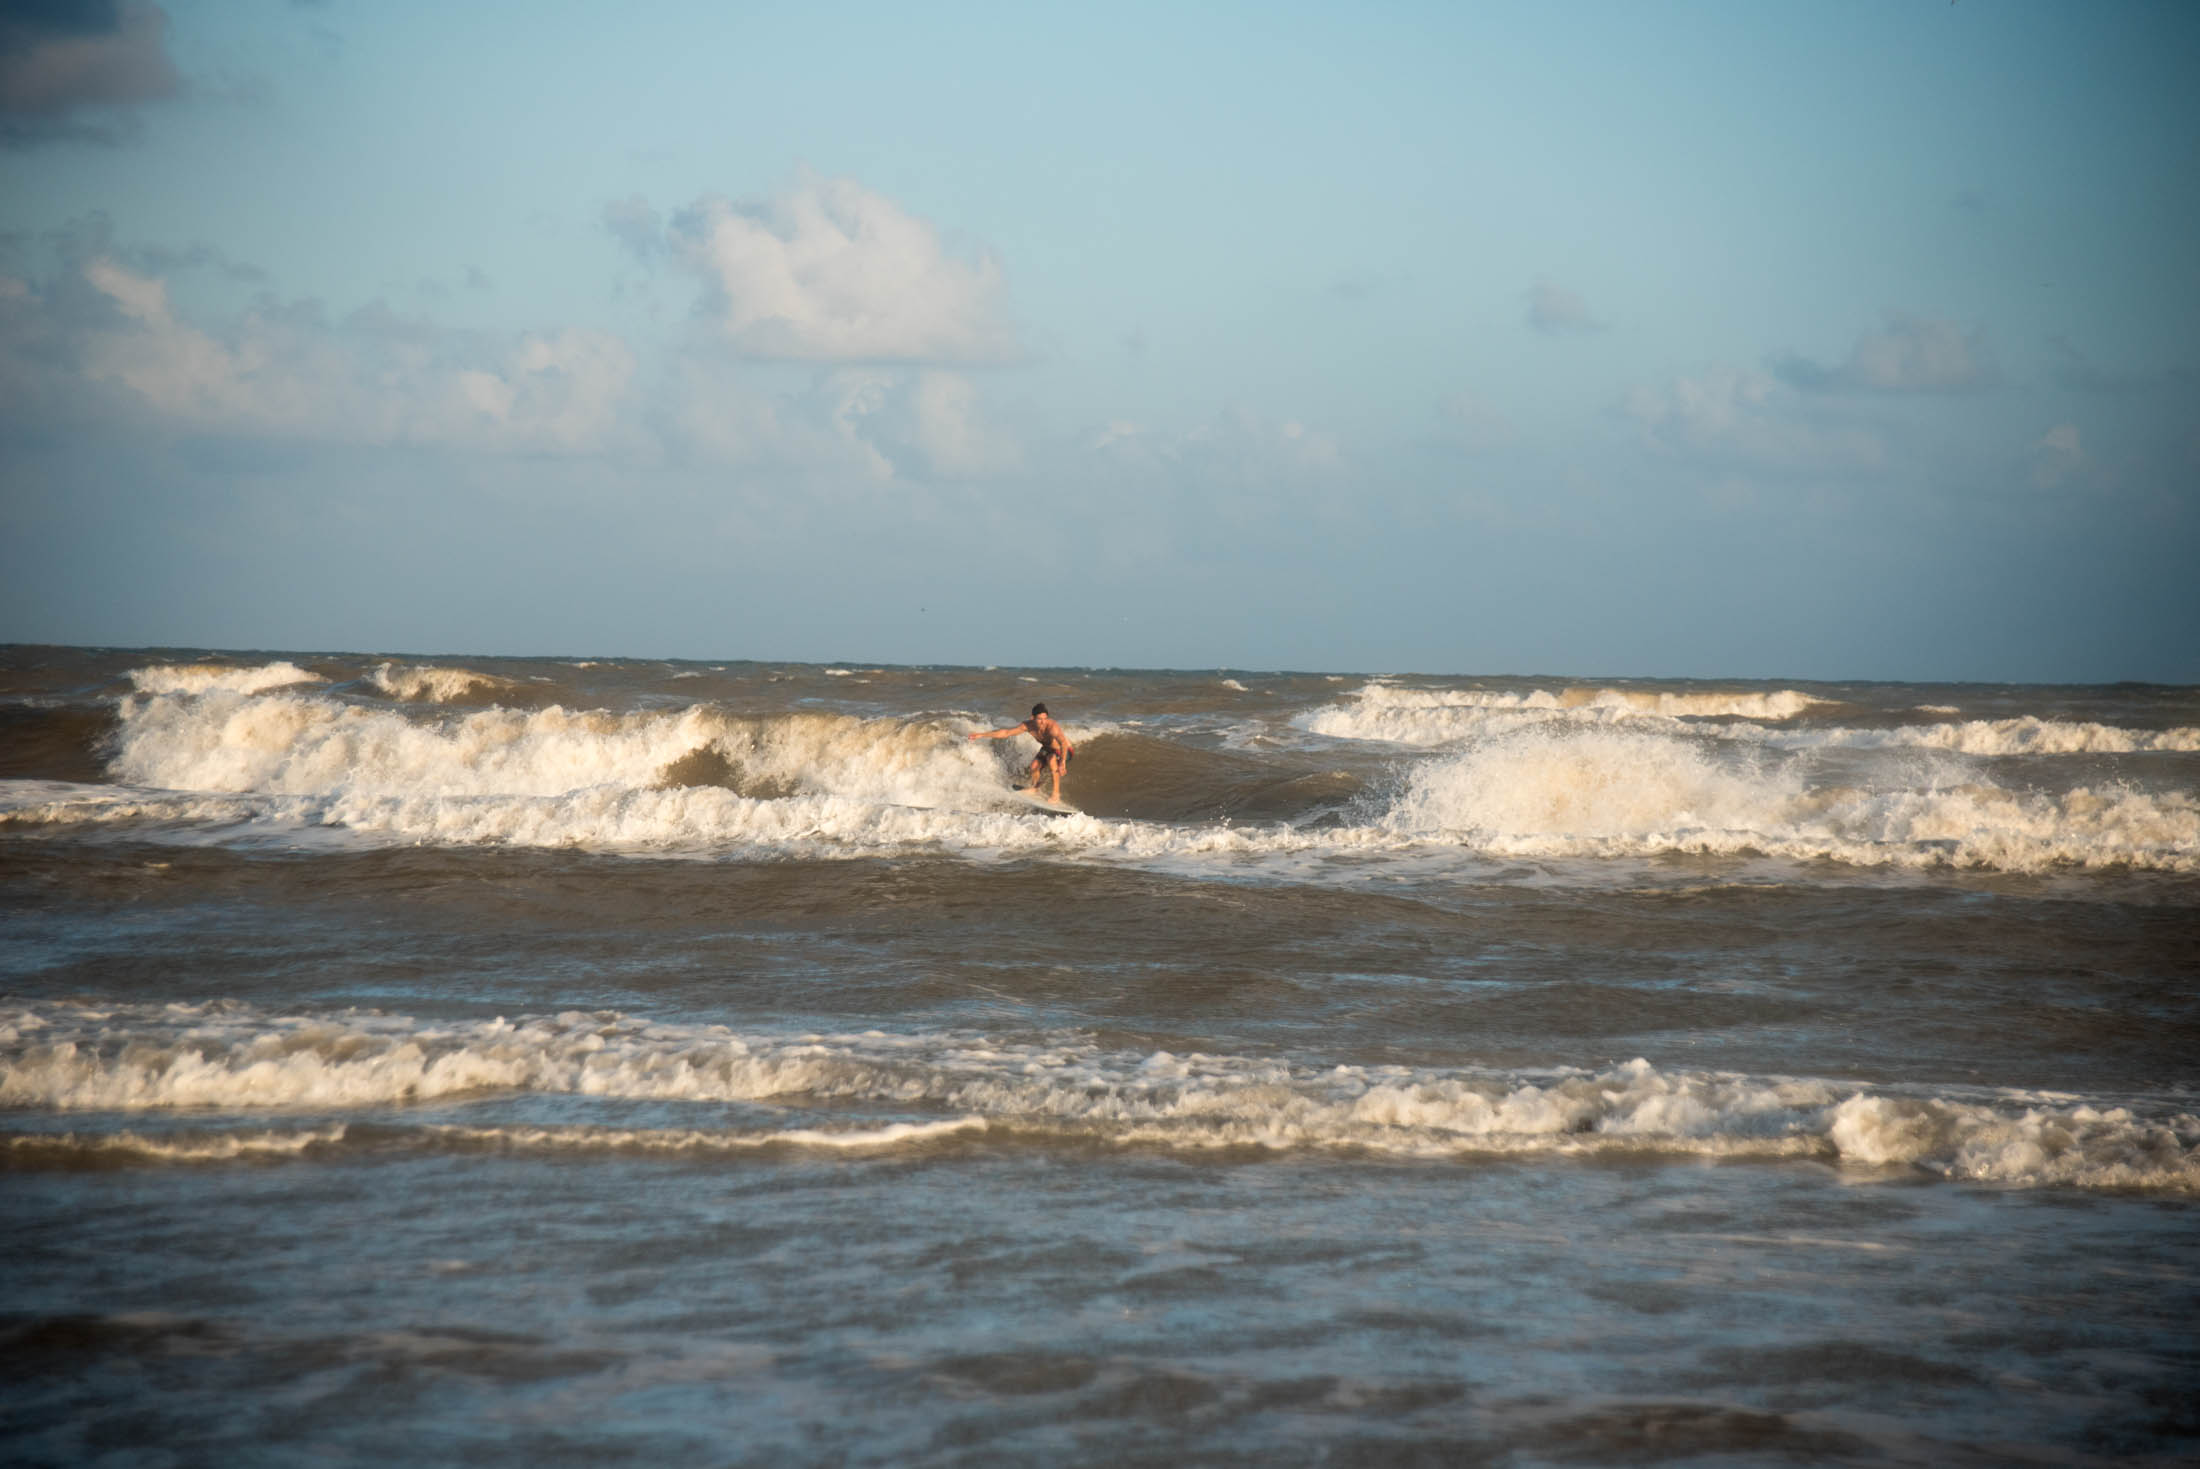 matagorda-beach-july-fourth-15